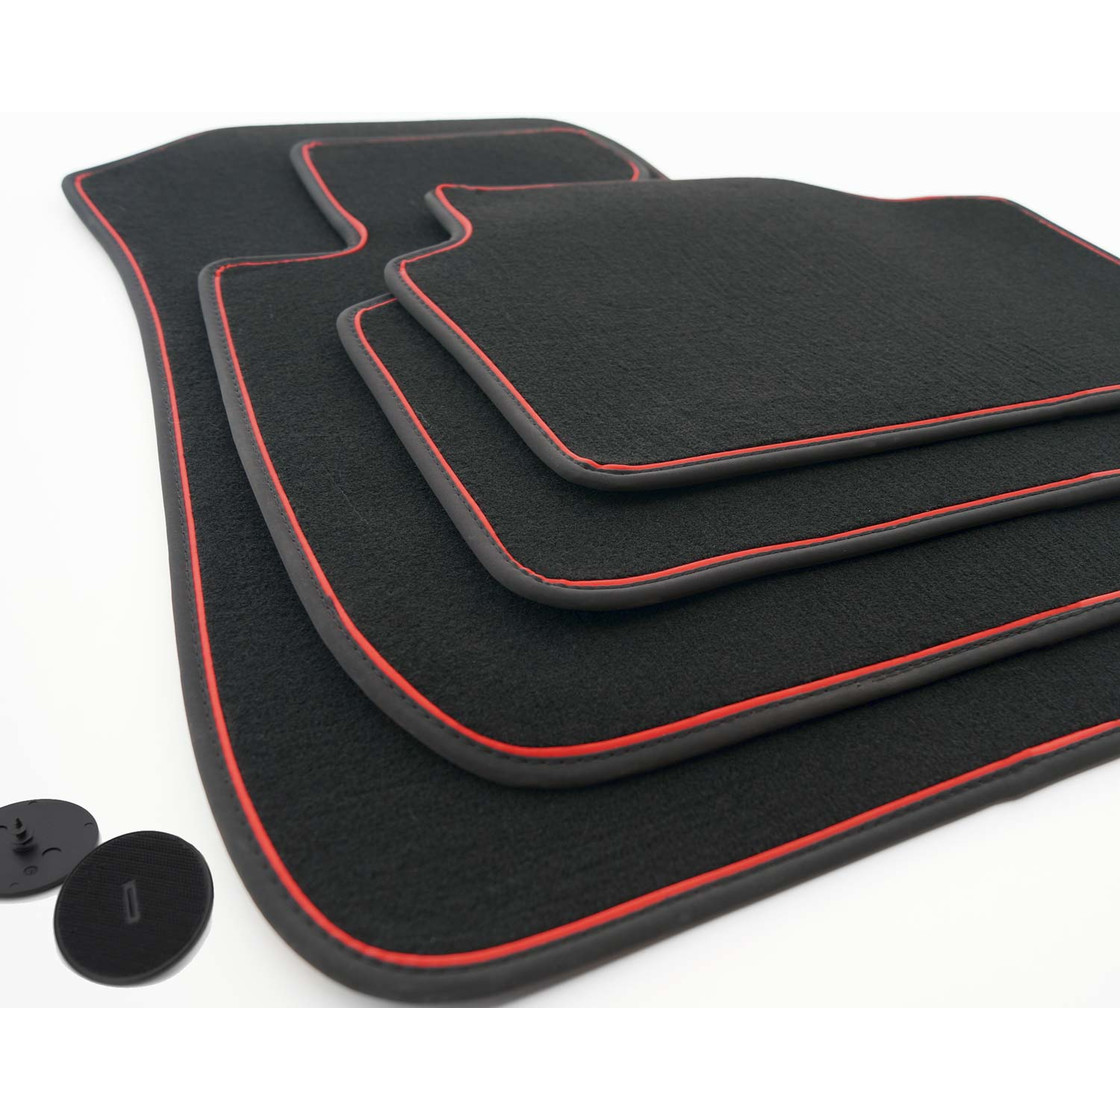 bmw 3er e90 2005 2013 fu matten velours zierband rot. Black Bedroom Furniture Sets. Home Design Ideas